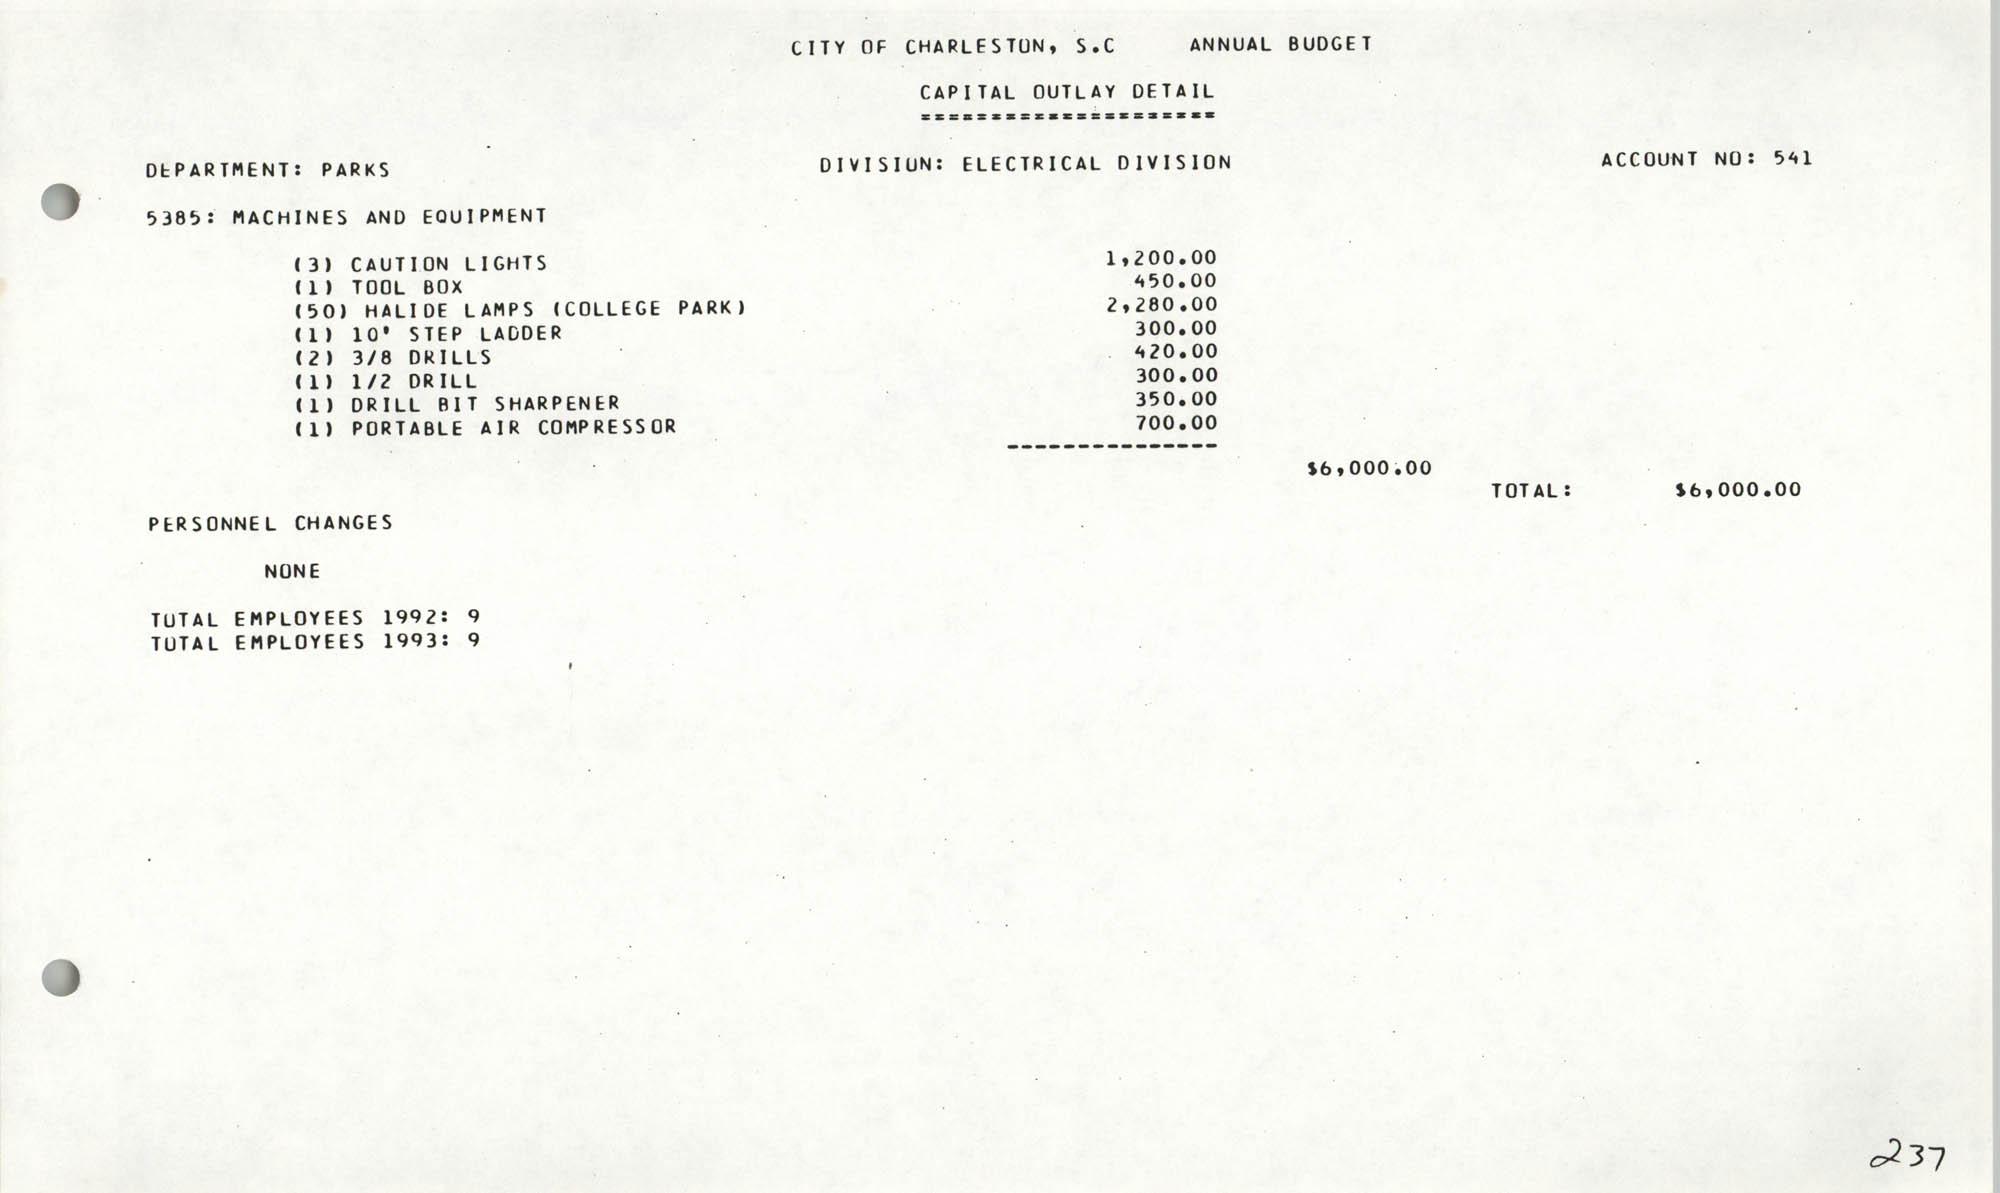 The City Council of Charleston, South Carolina, 1993 Budget, Page 237